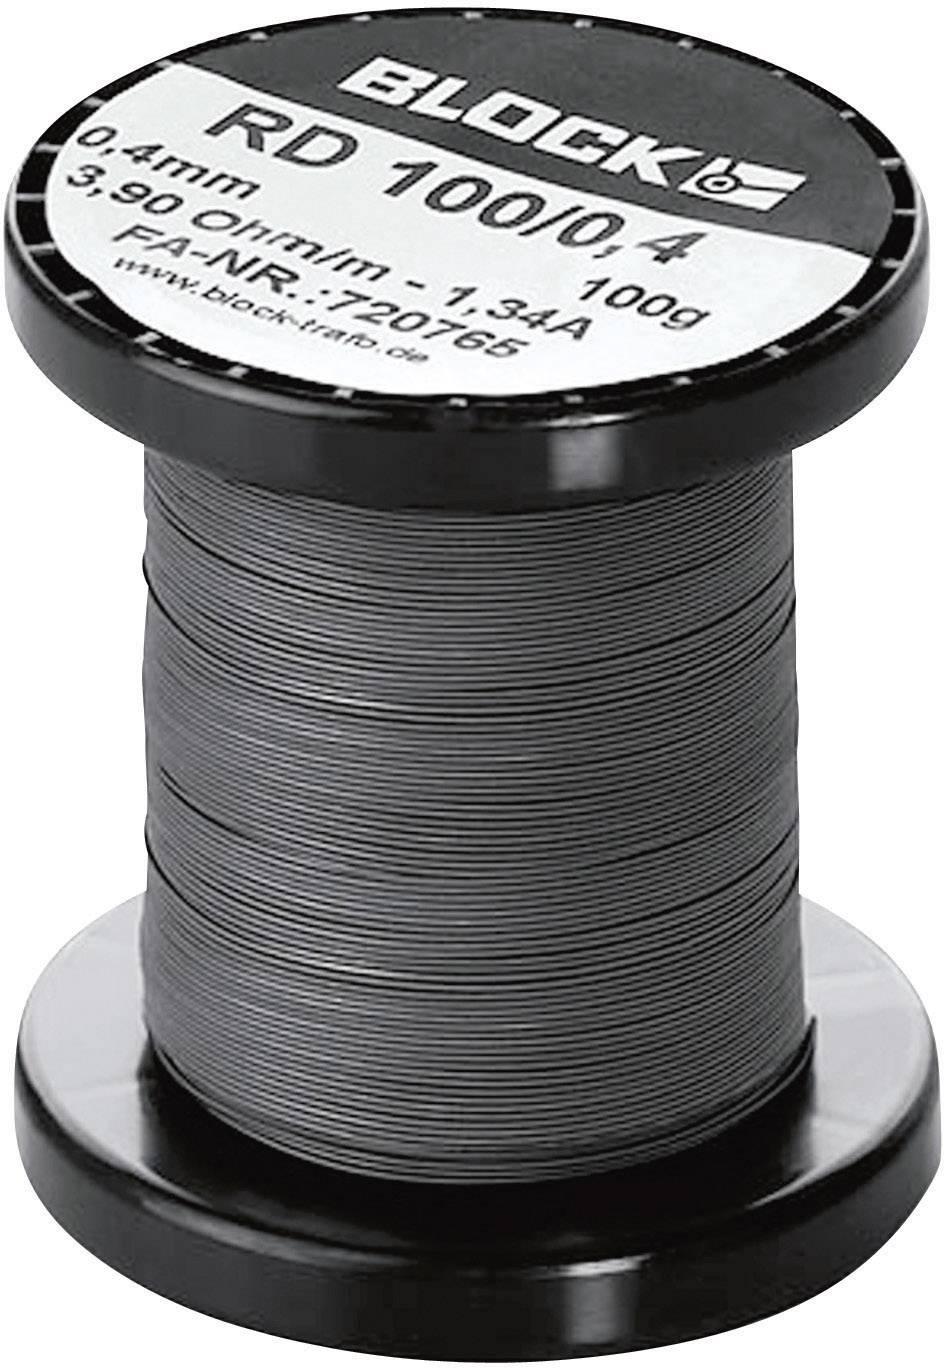 Odporový drát (konstantan) 0.277 Ω/m Block RD 100/1,5 6.3 m